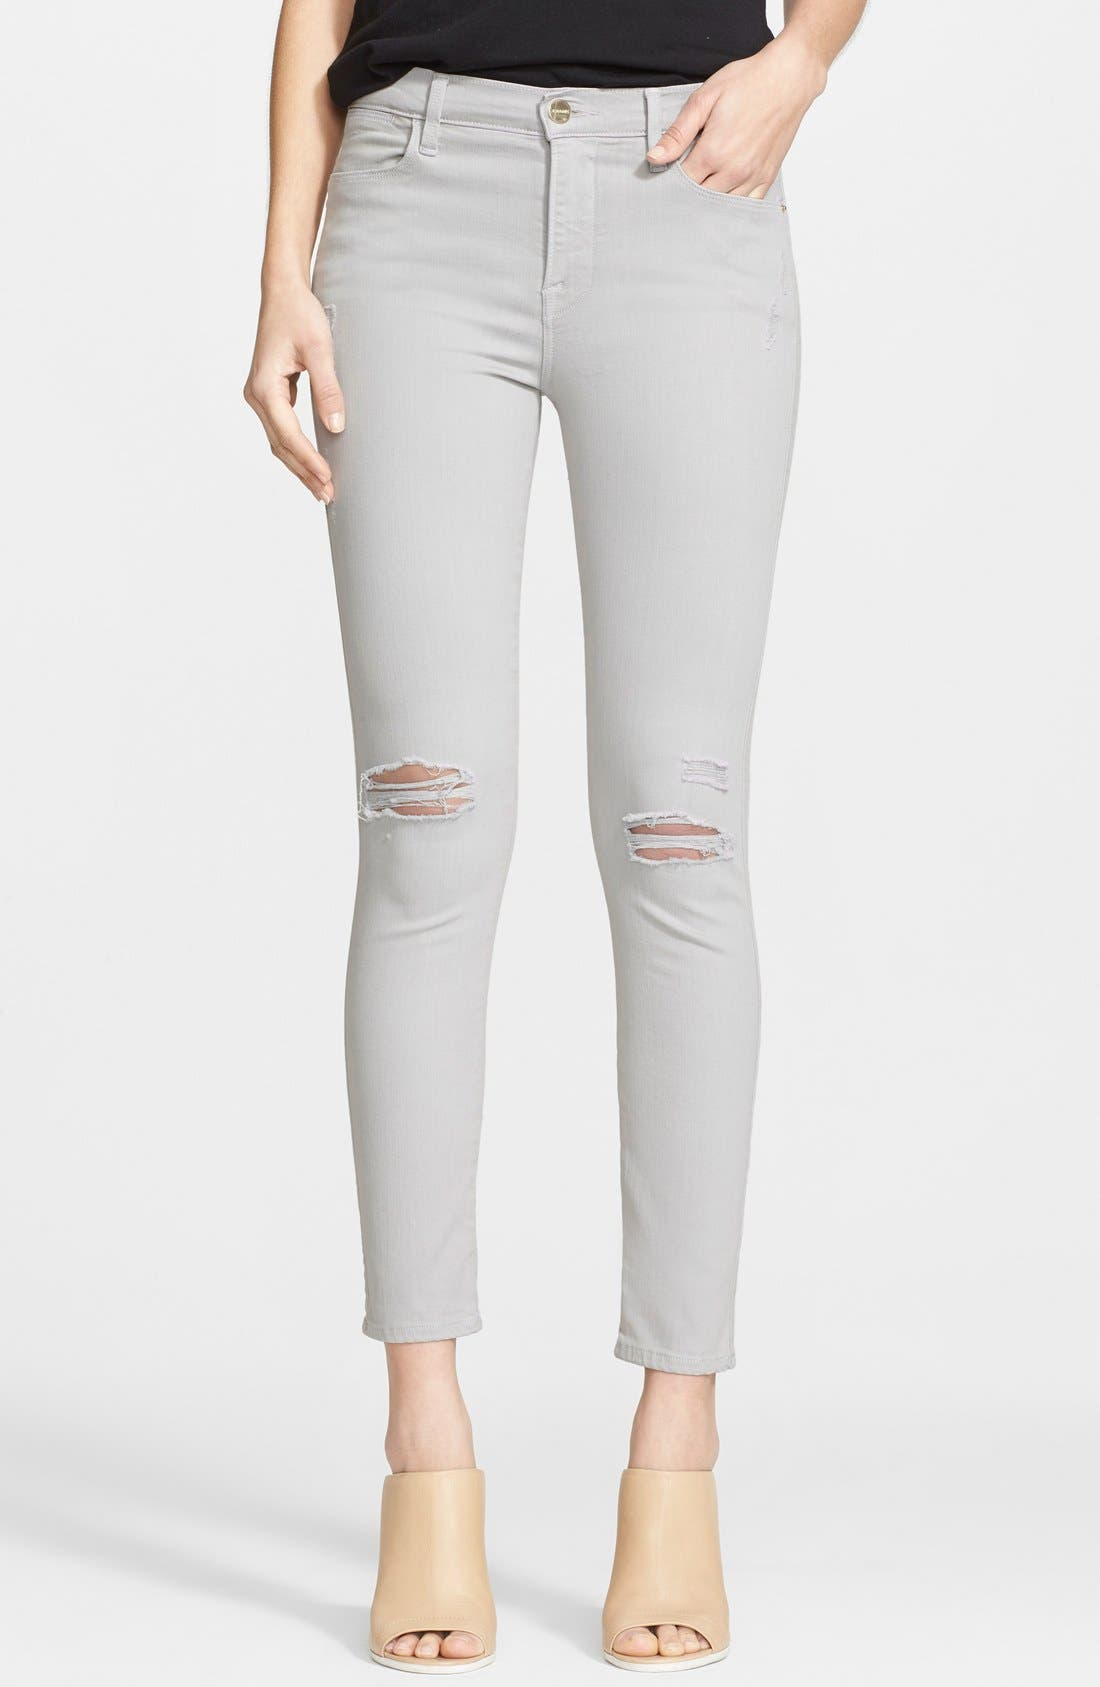 Alternate Image 1 Selected - Frame Denim 'Le High Skinny Rip' Destroyed Jeans (Putty)